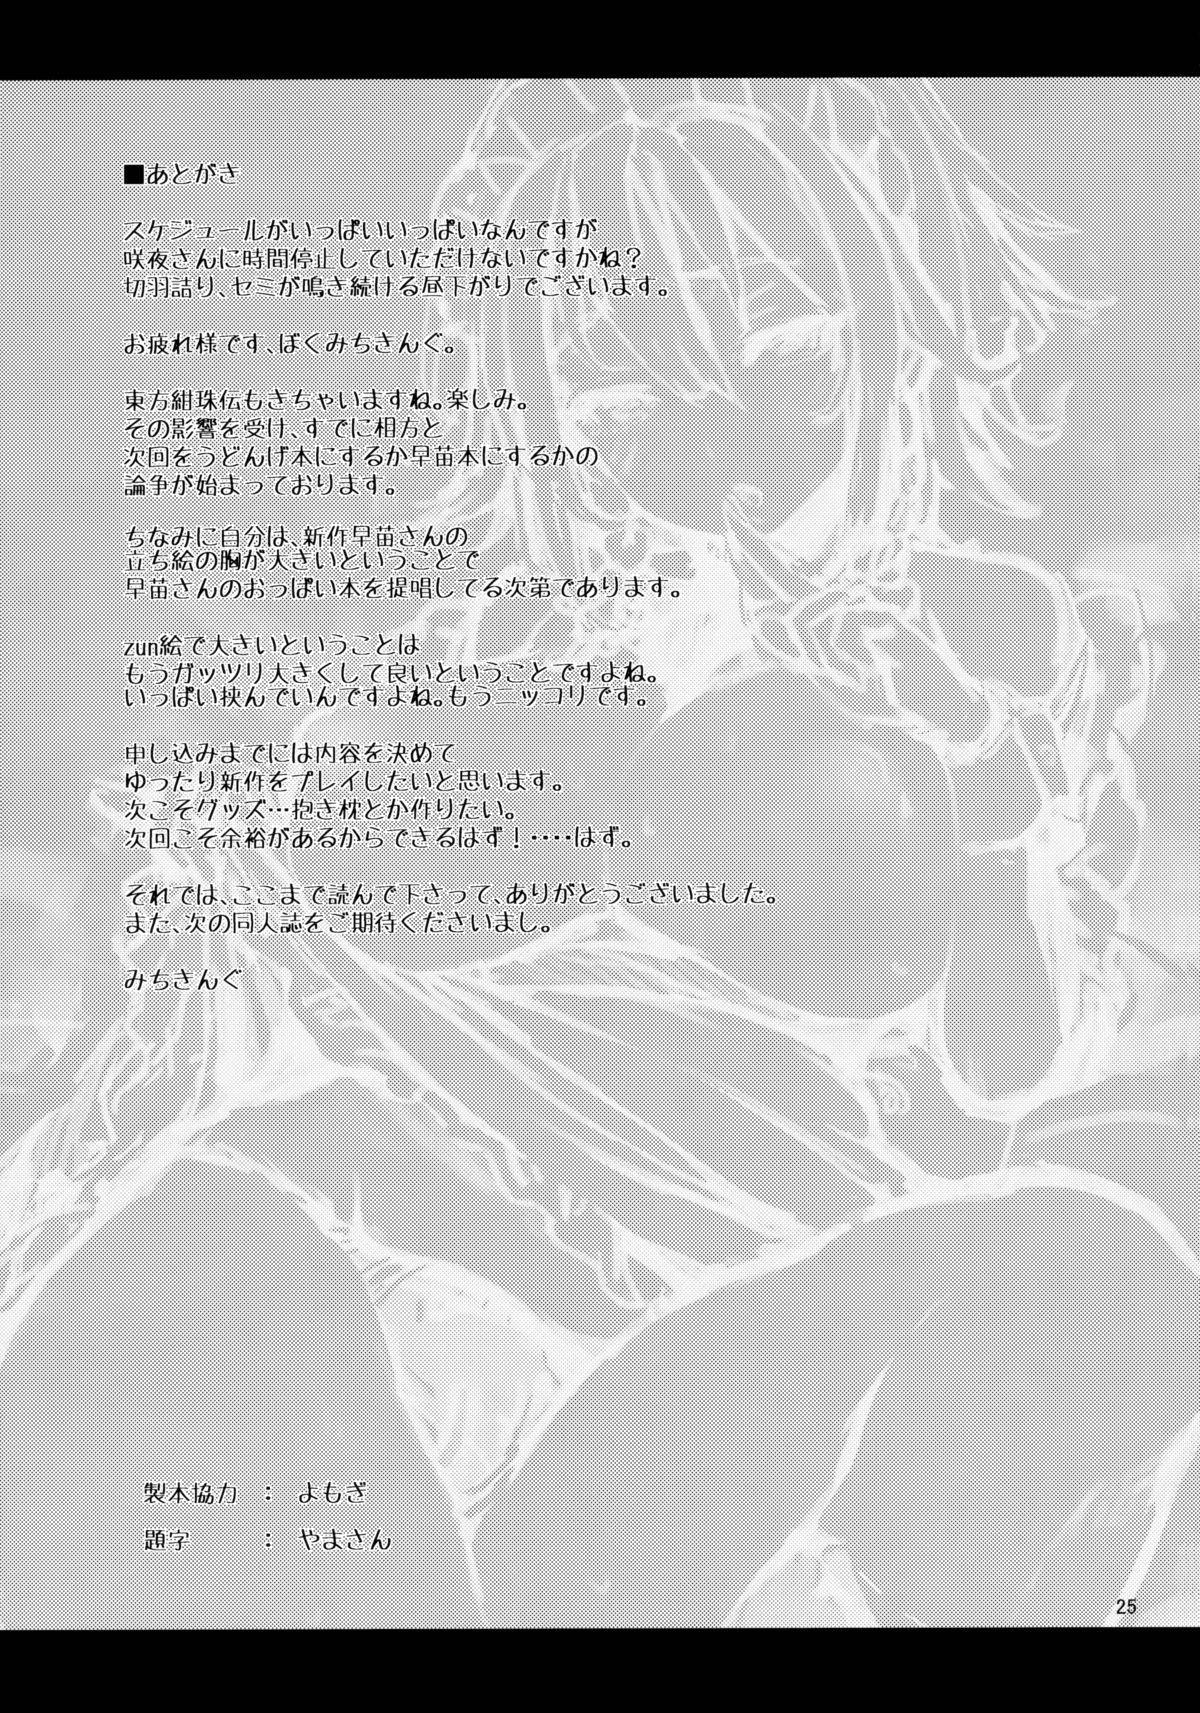 (C88) [Anmitsuyomogitei (Michiking)] Shasei Kanri Shite Kudasai Sakuya-san! | Take Care of My Ejaculations Please, Sakuya-san! (Touhou Project) [English] [PSYN+Facedesk] [Decensored by Anon] 23